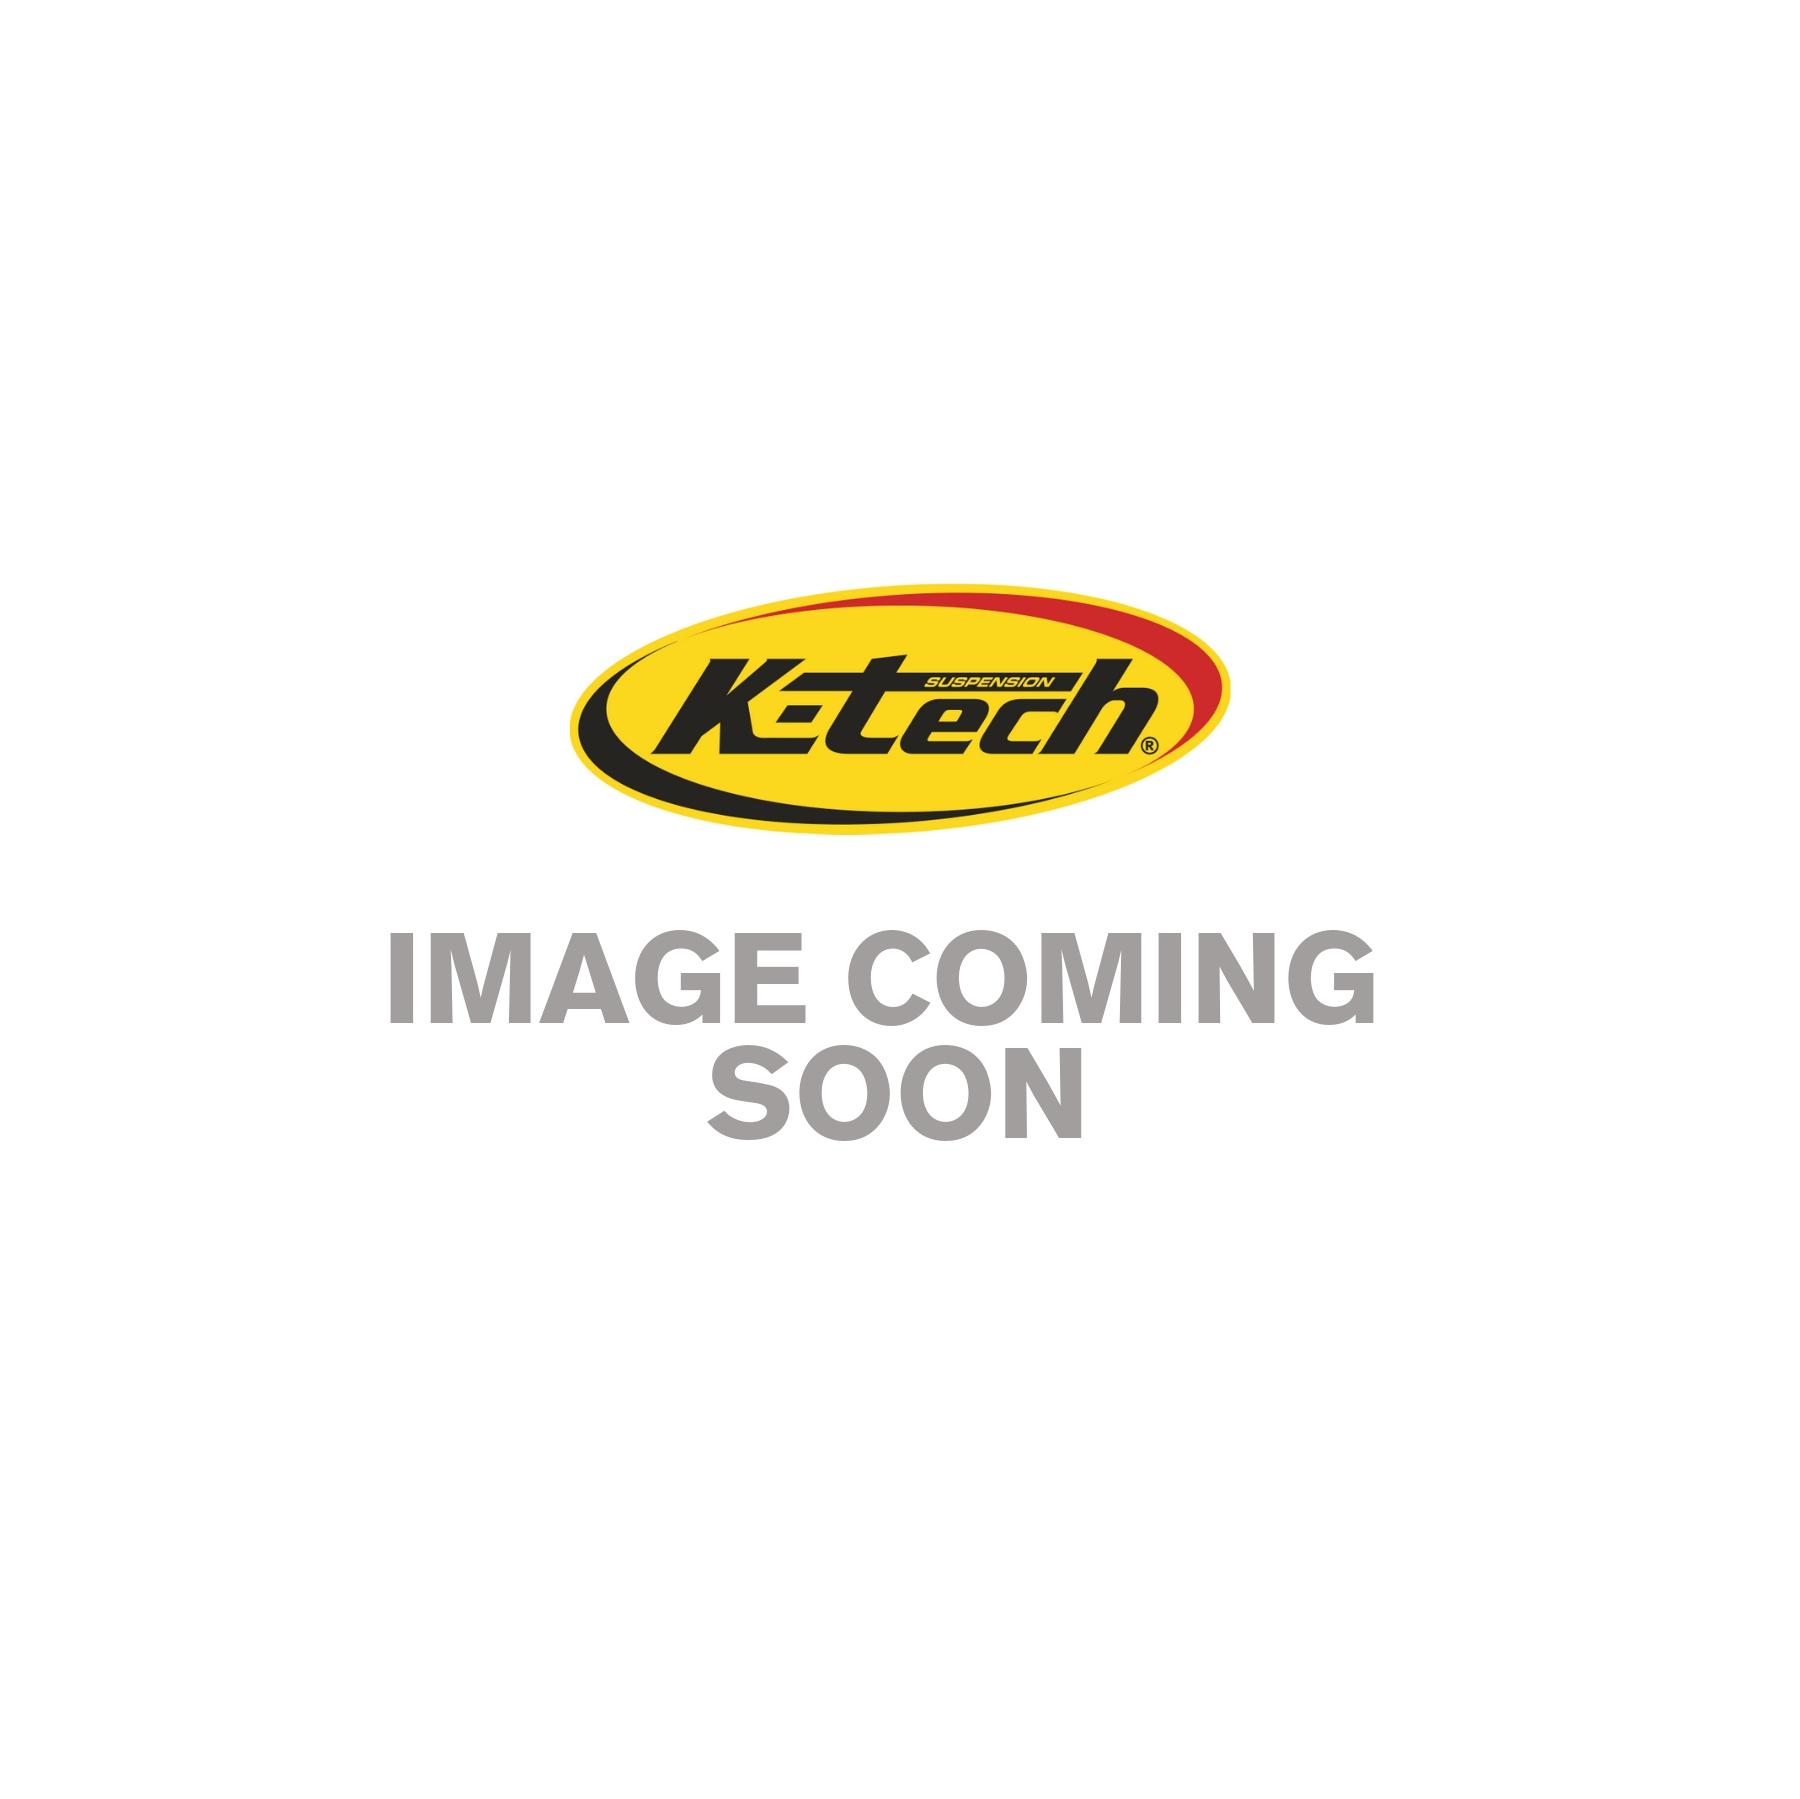 20IDS Front Fork Cartridges Honda CB500 2013-2015 Showa